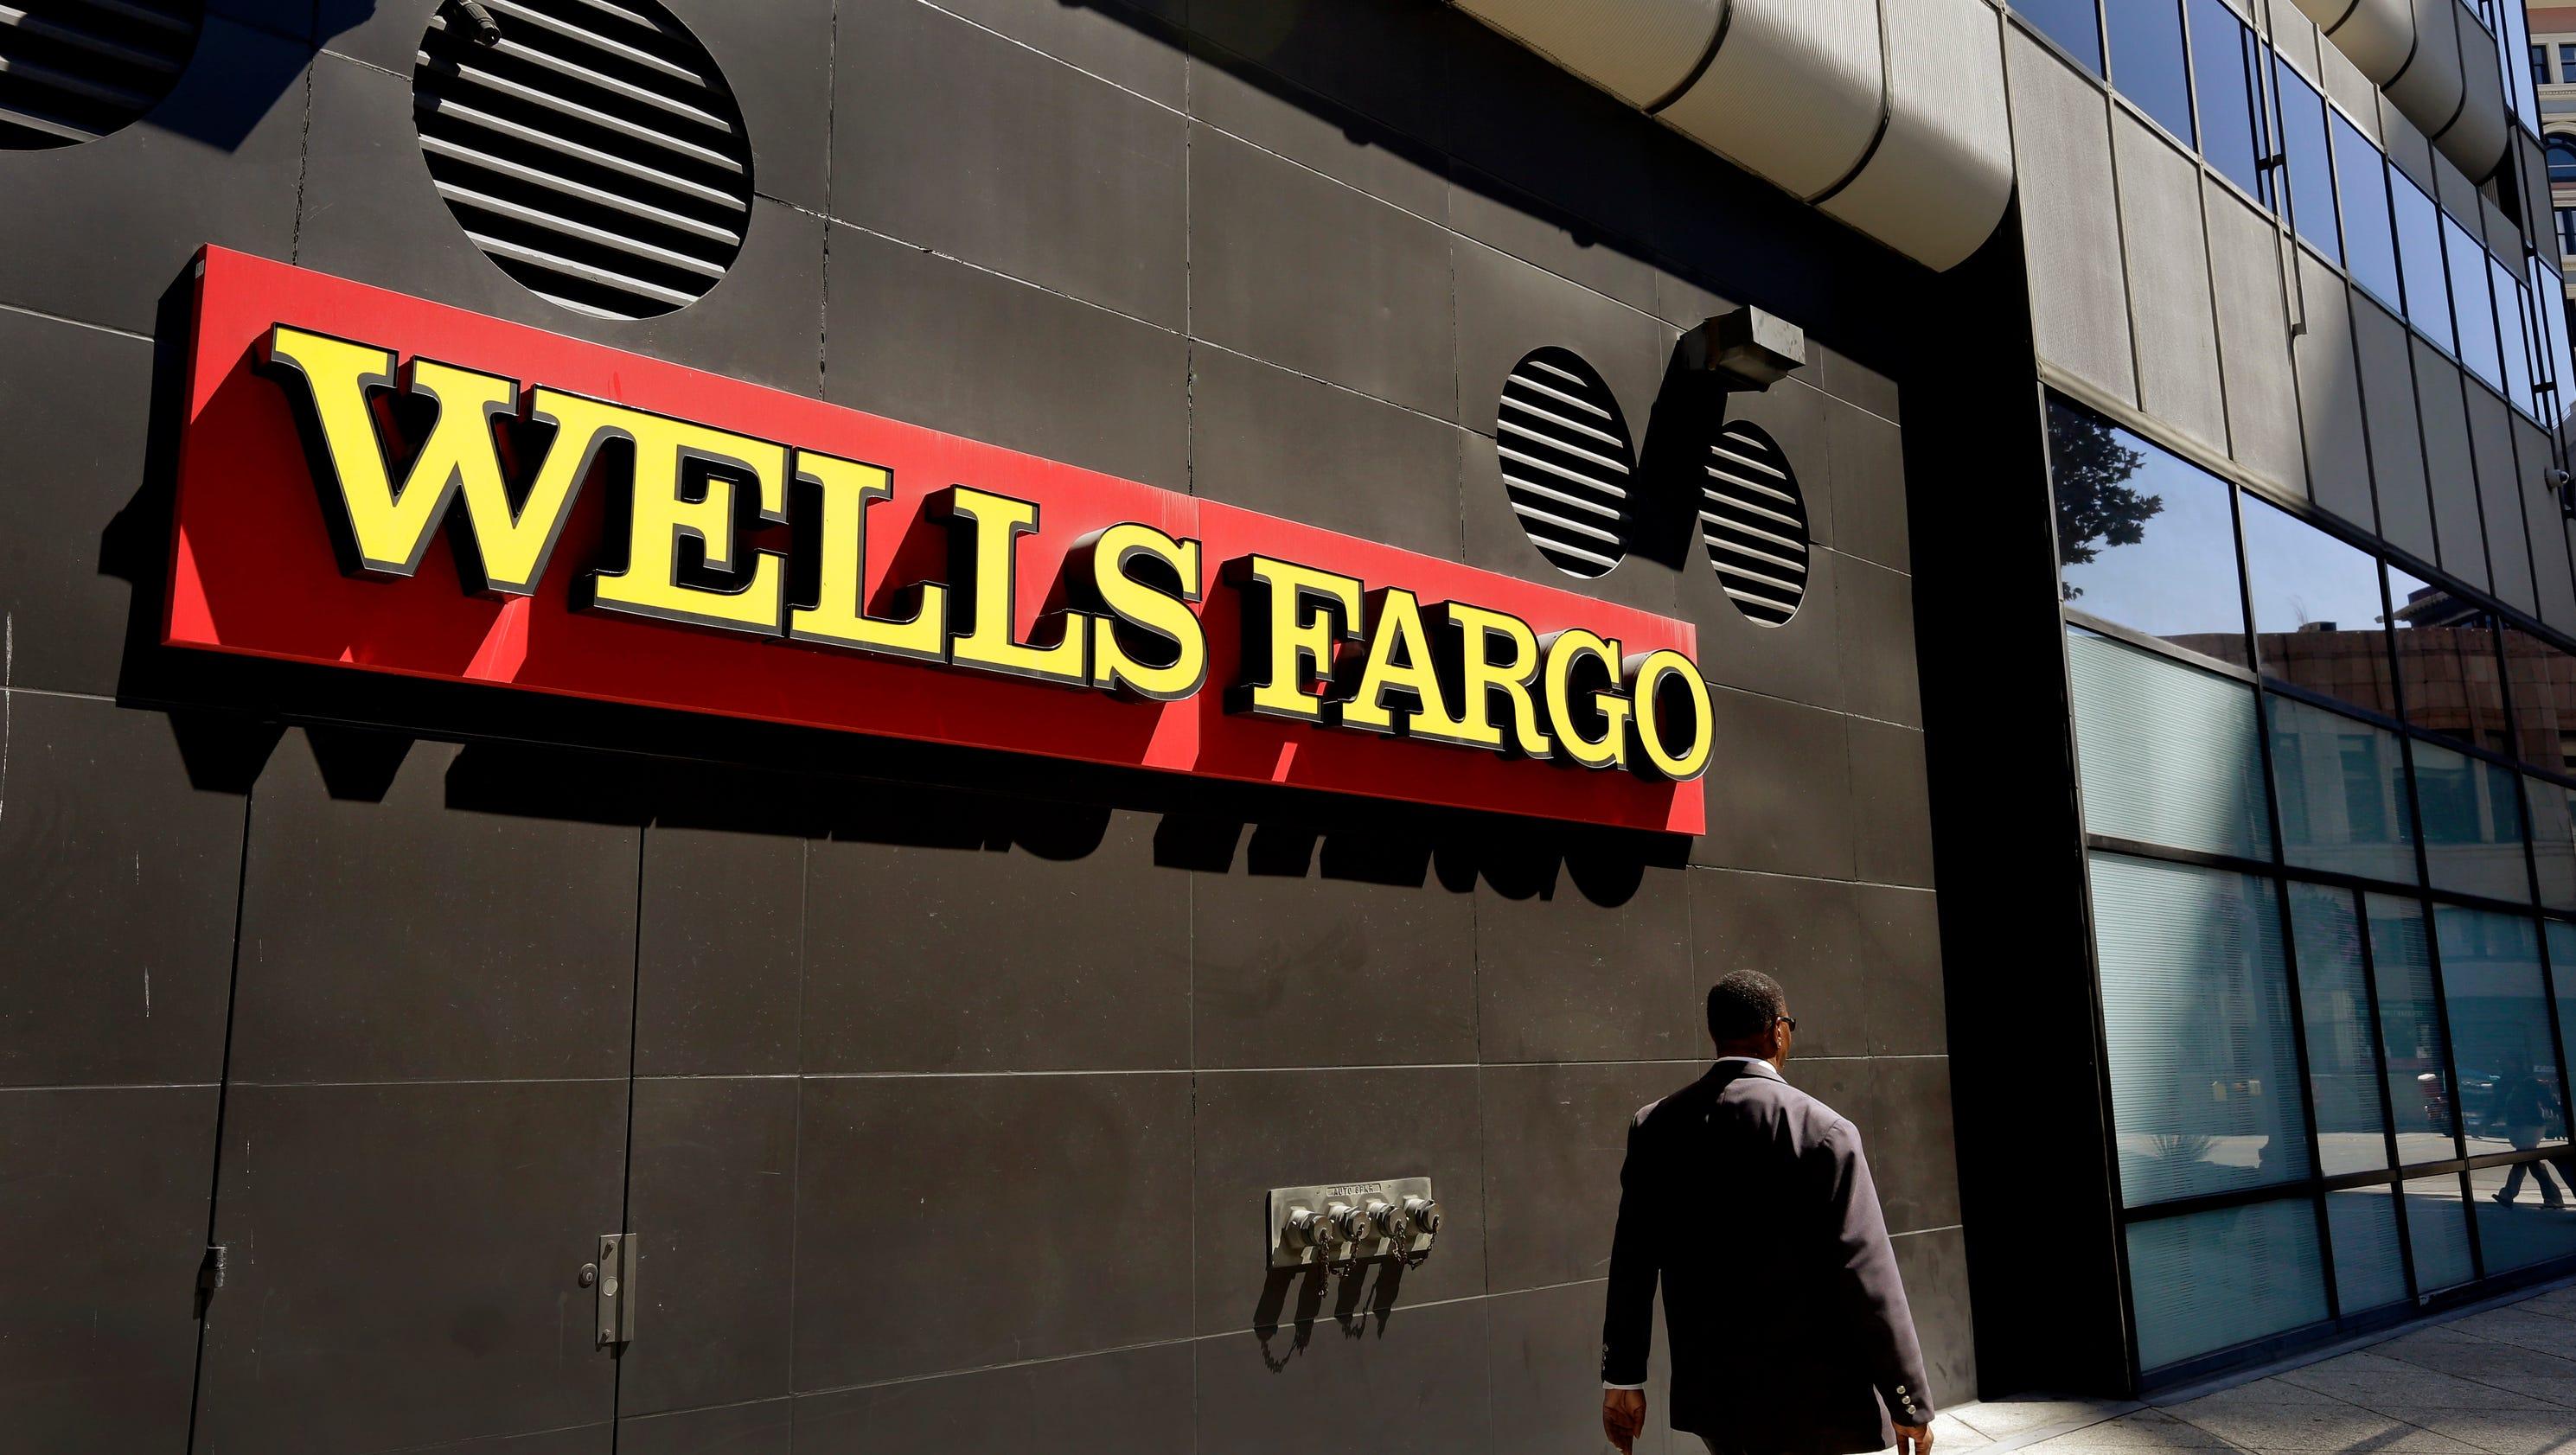 wells fargo fined 3 6m over student loan practices. Black Bedroom Furniture Sets. Home Design Ideas